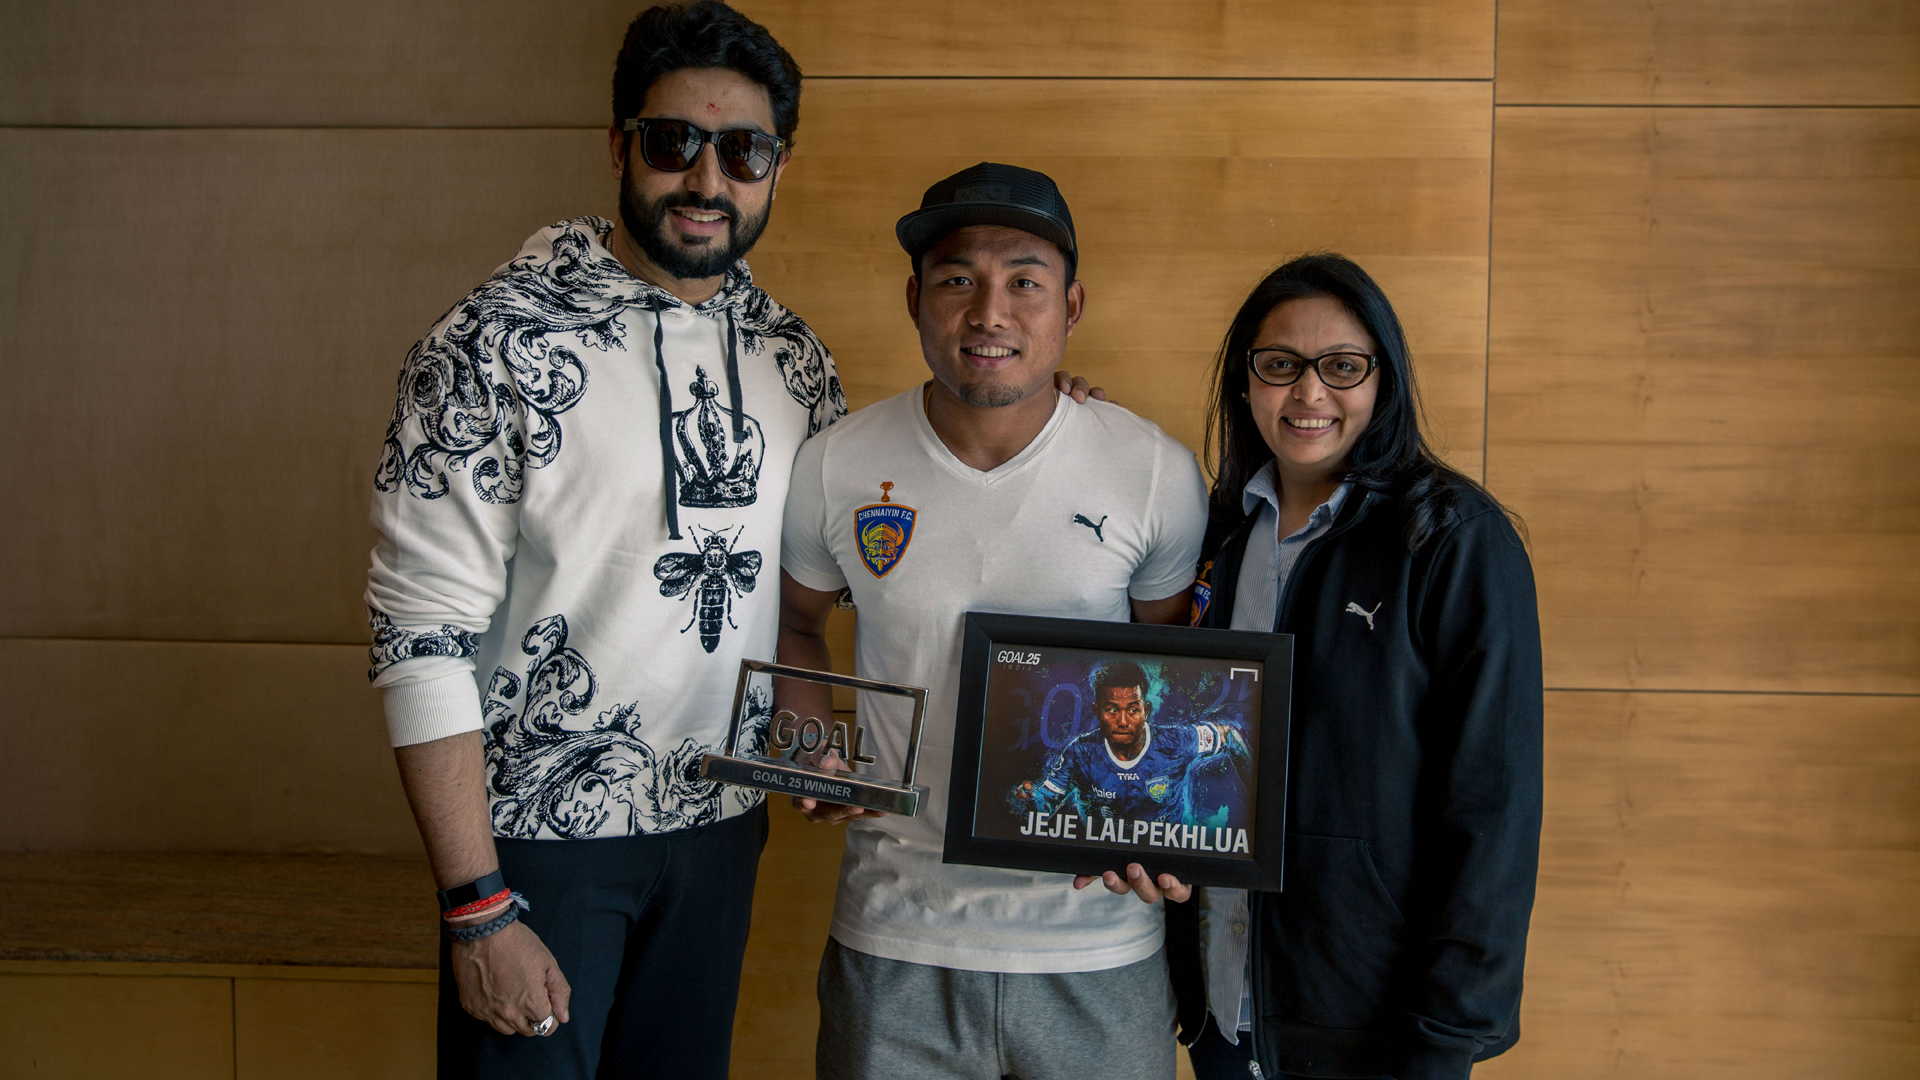 Jeje Lalpekhlua Abhishek Bachchan Goal 25 India